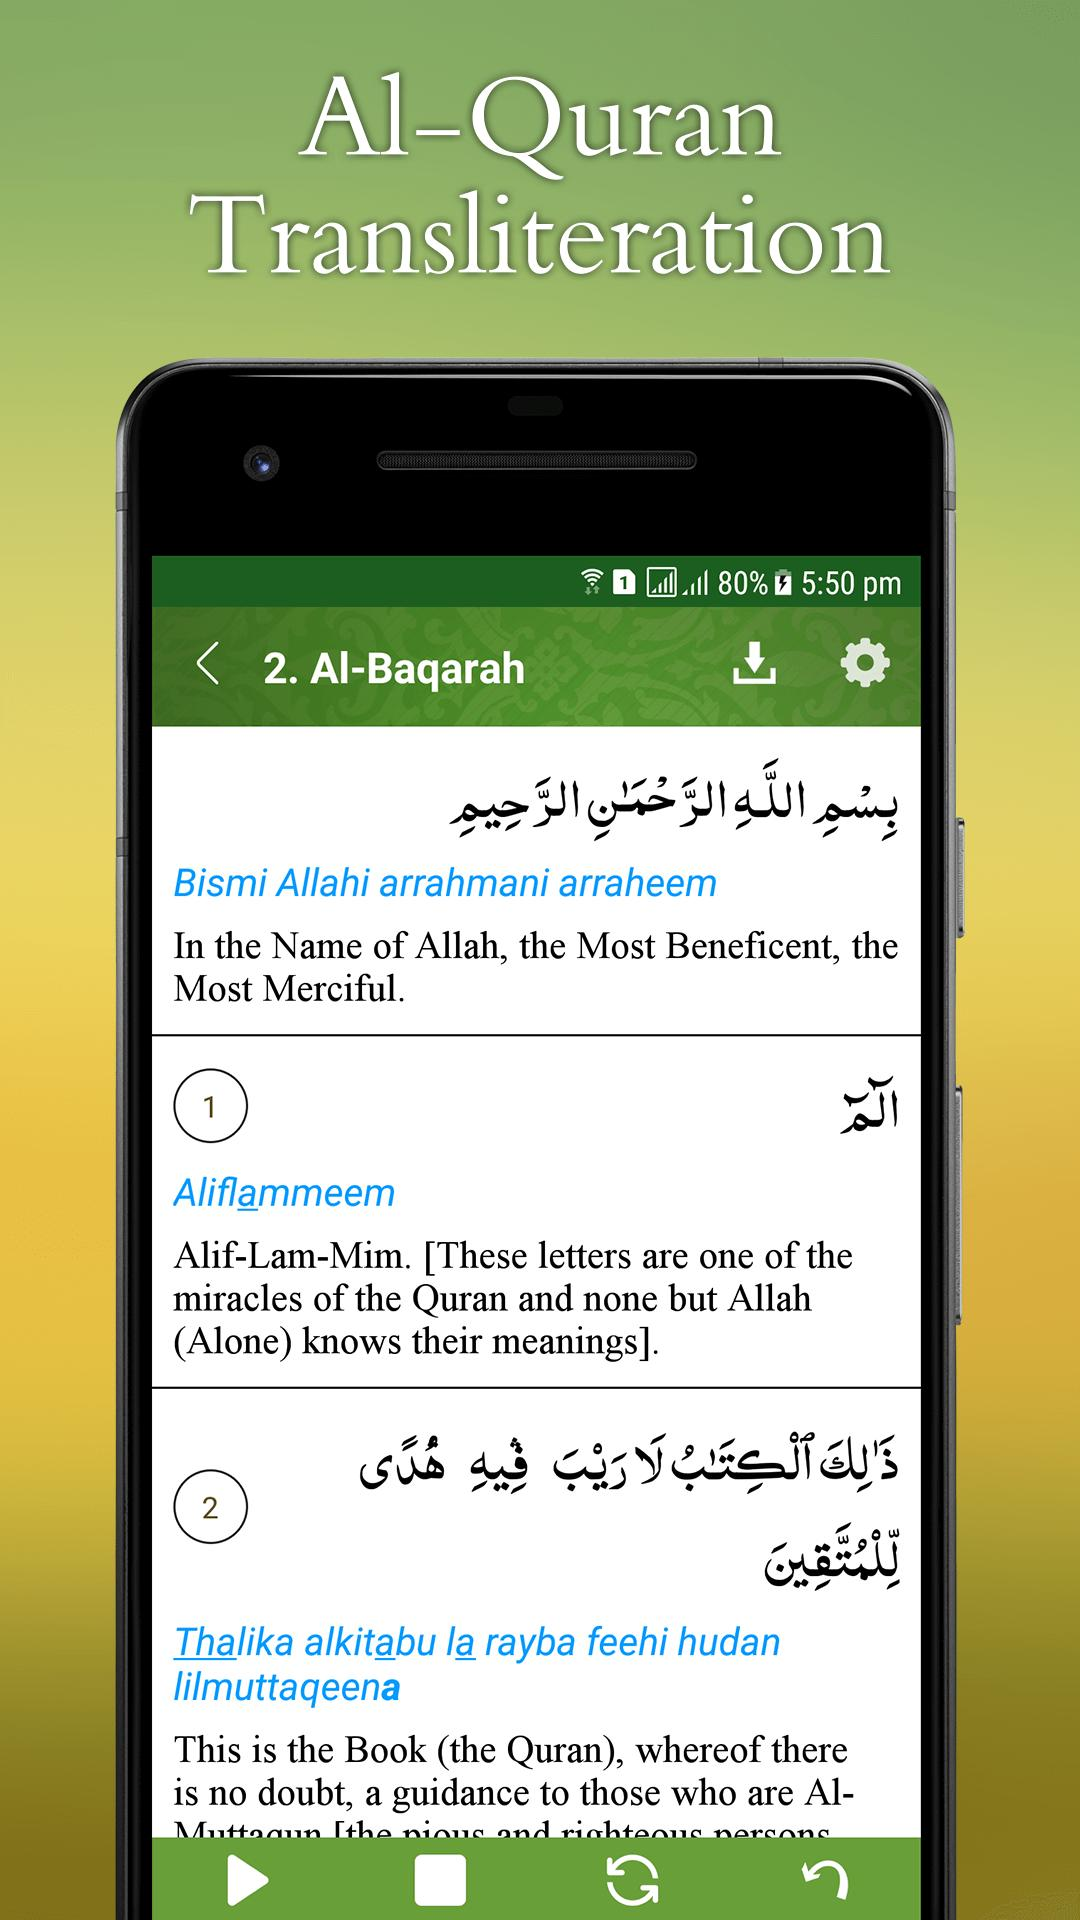 Al Quran Transliteration for Android - APK Download